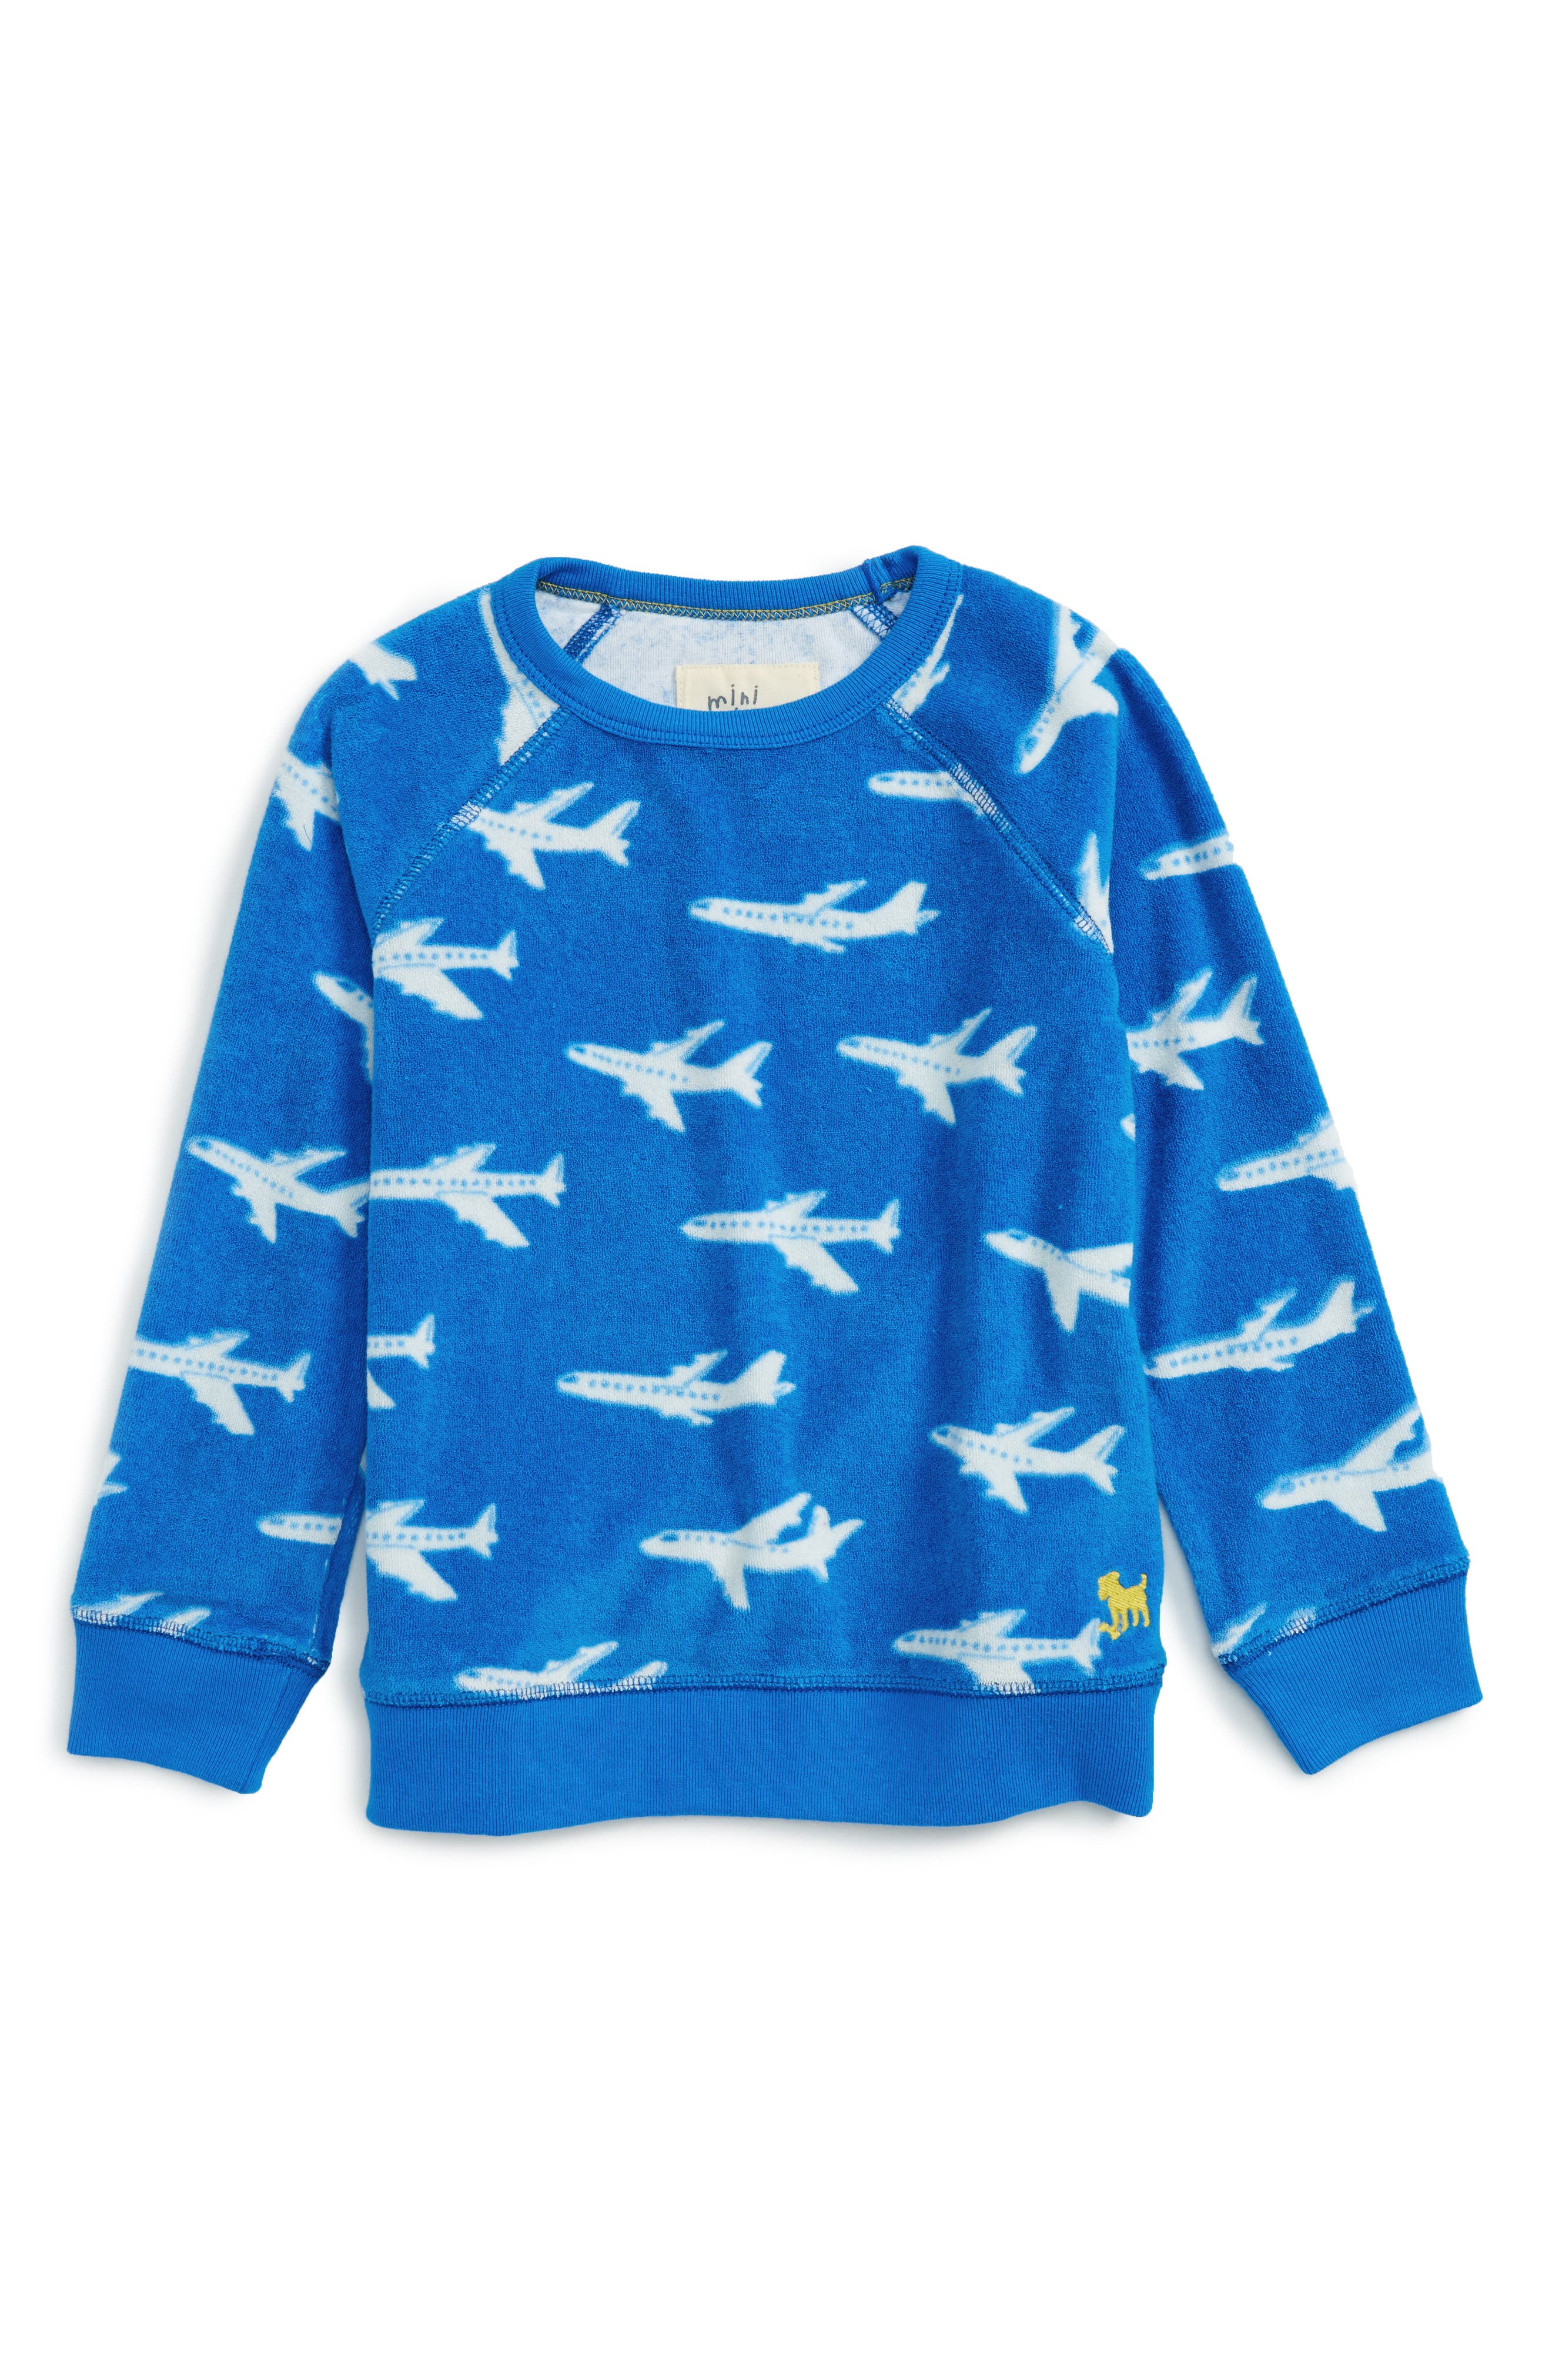 Toweling Sweatshirt,                         Main,                         color, Skipper Blue Planes